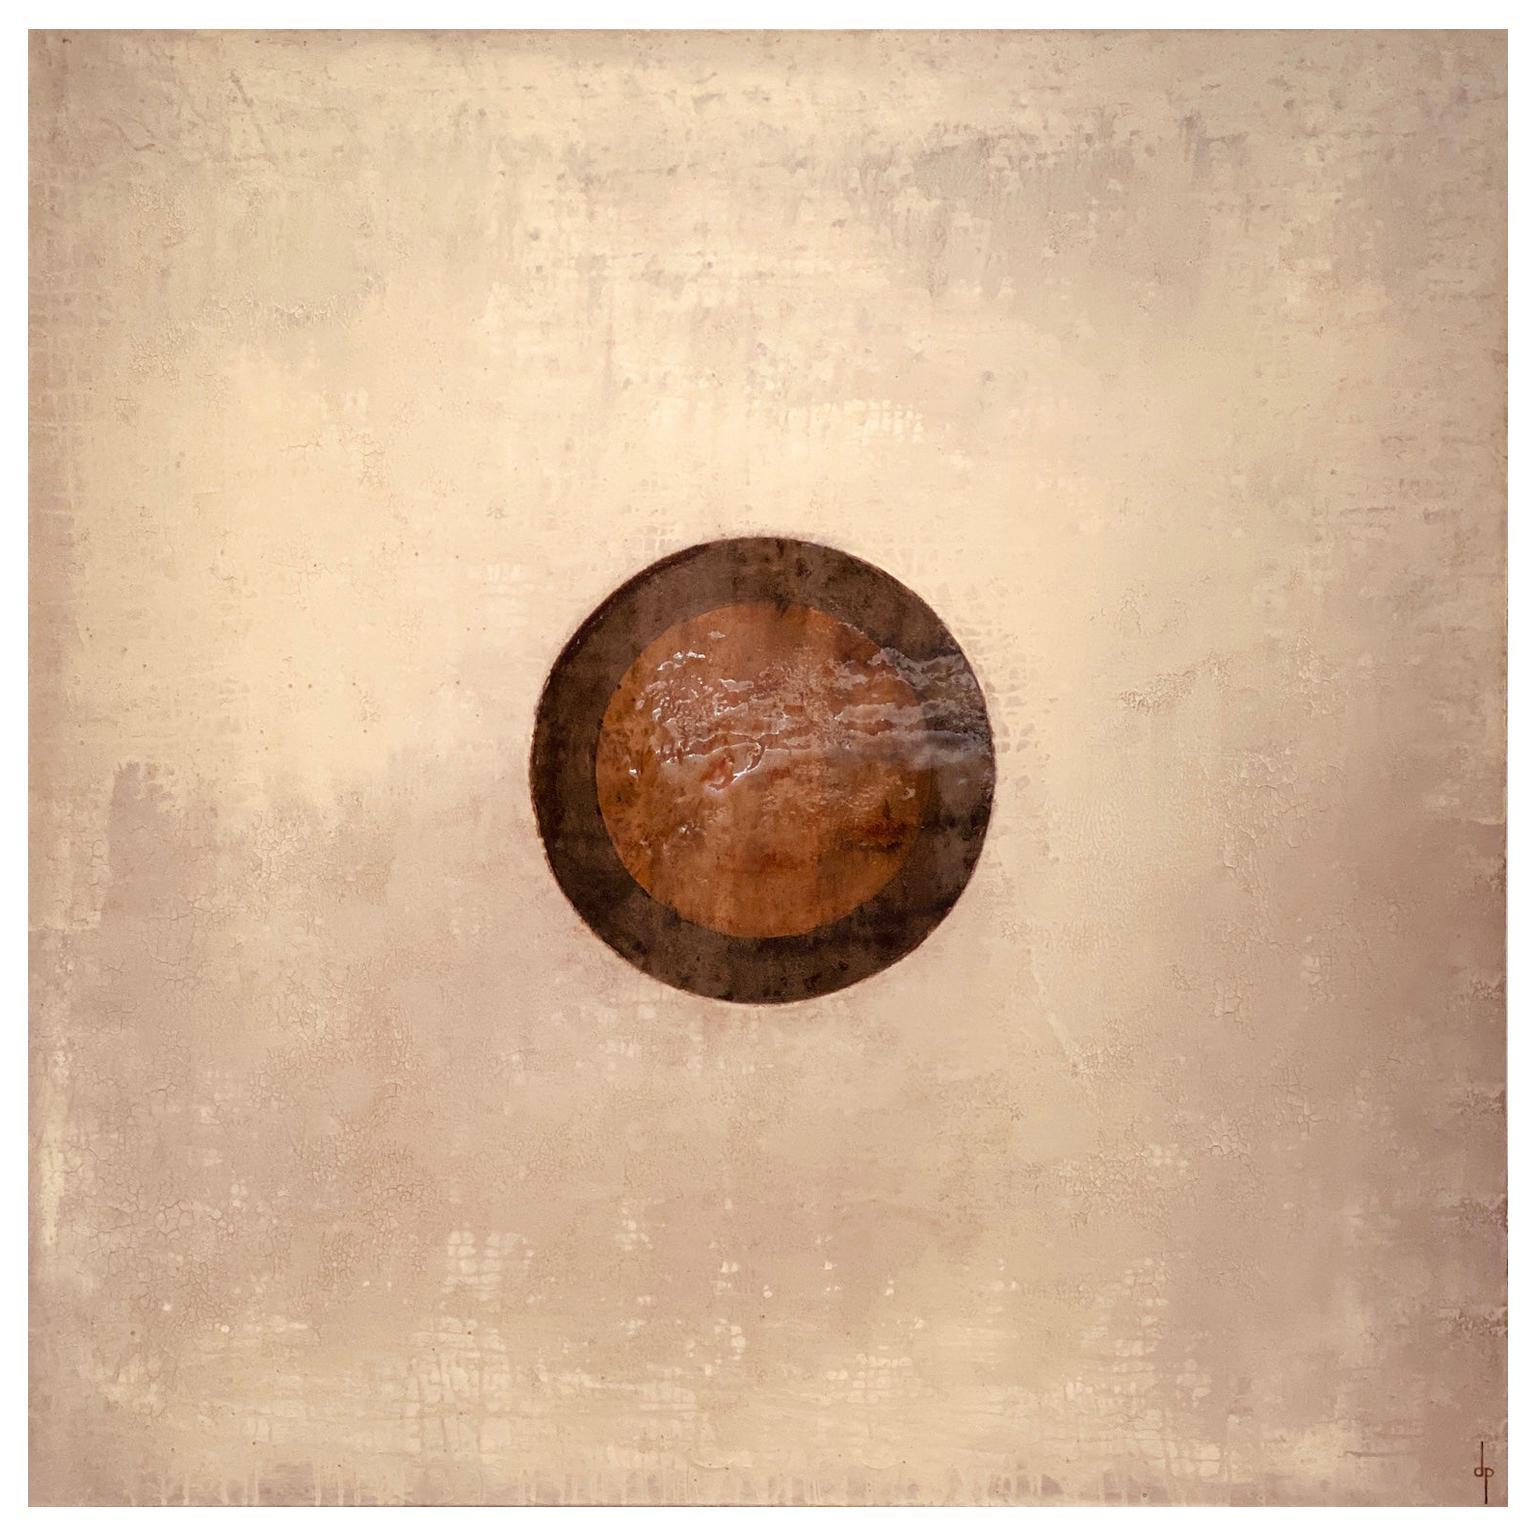 Denis Perrollaz Cercle et Éléments Painting in Mixed-Media